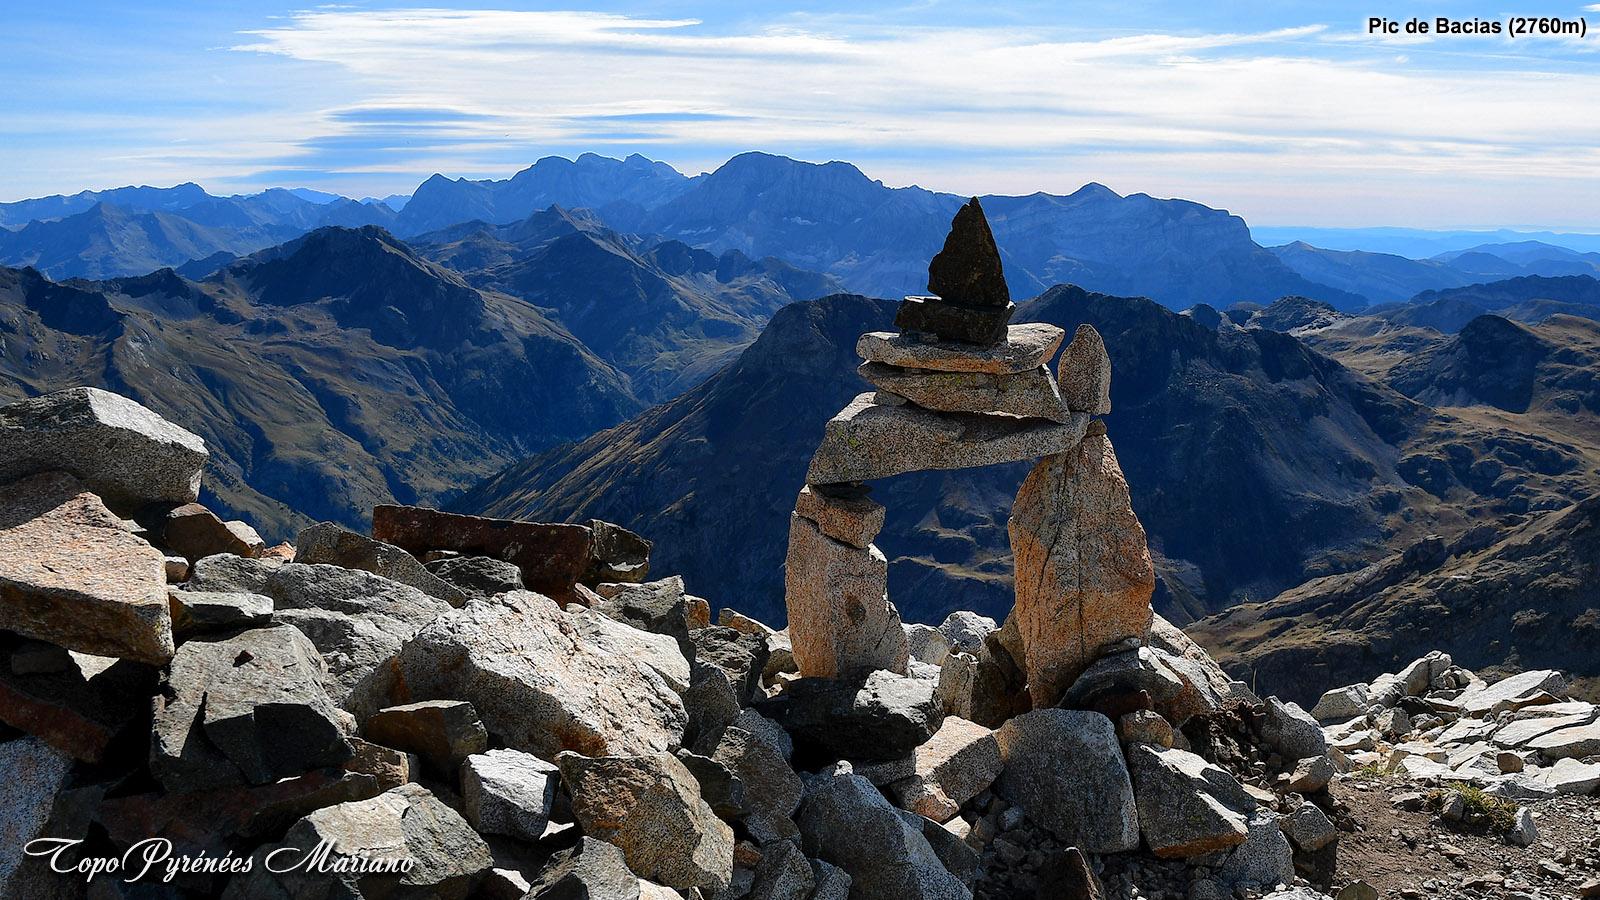 Randonnée Pic de Bacias (2760m)